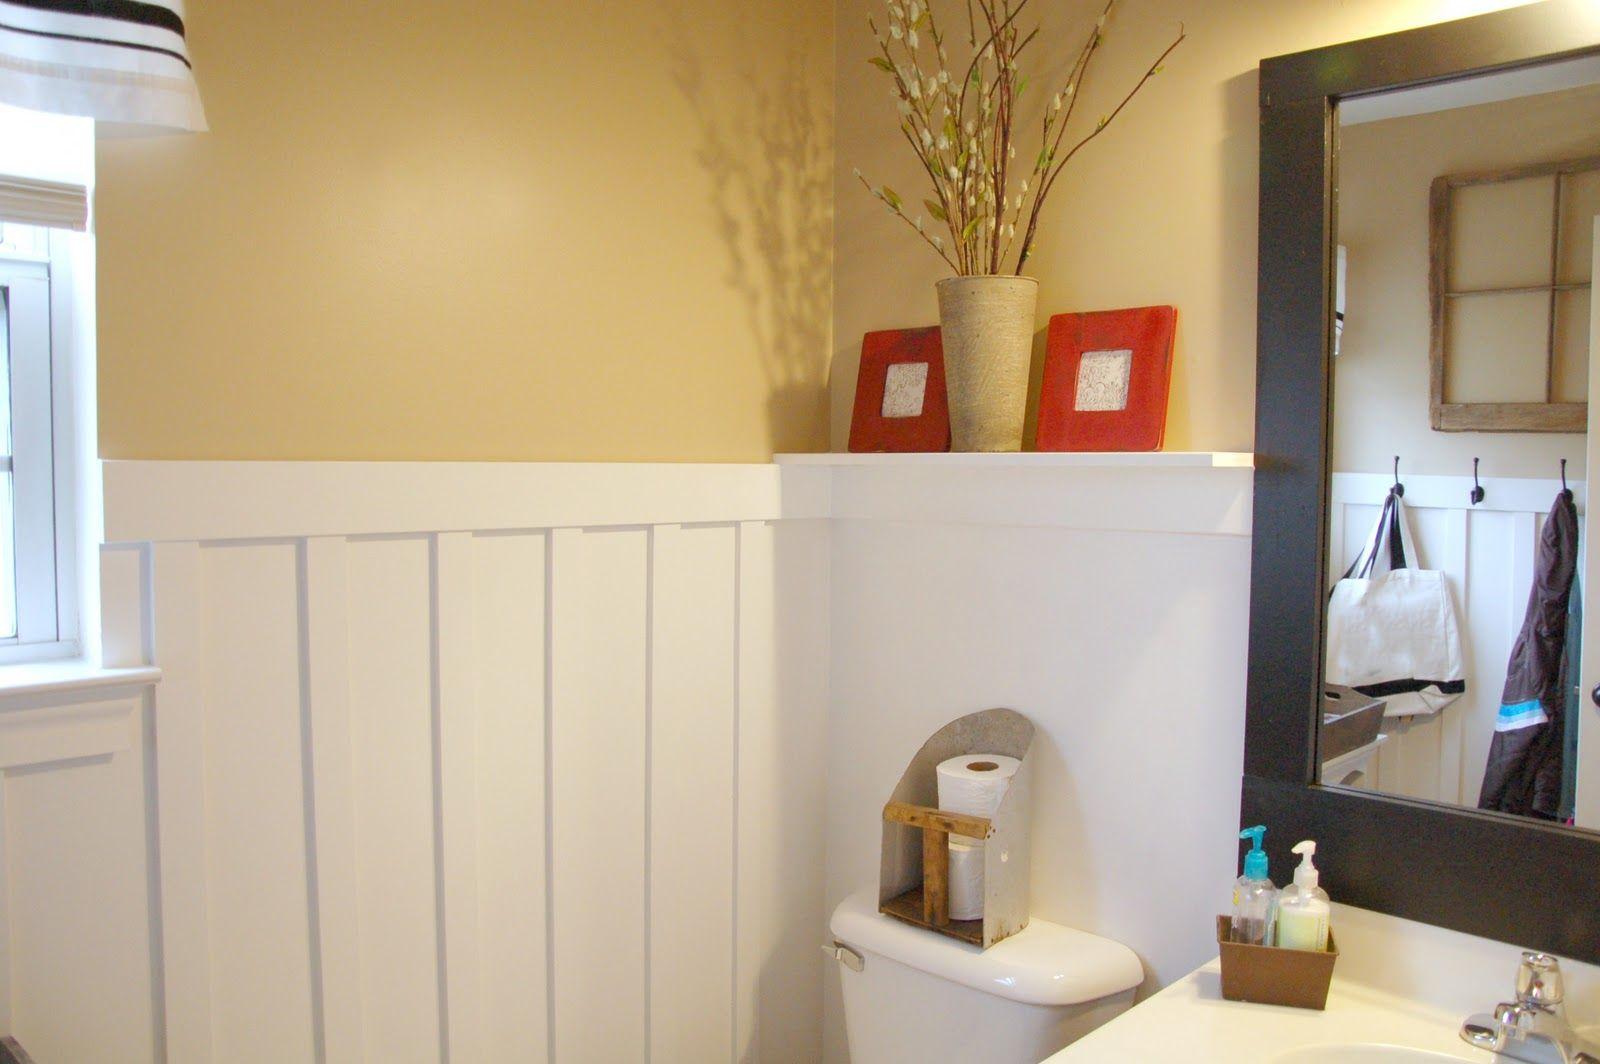 Bathroom interior wall things to put on a shelf in bathroom  interior designer  pinterest